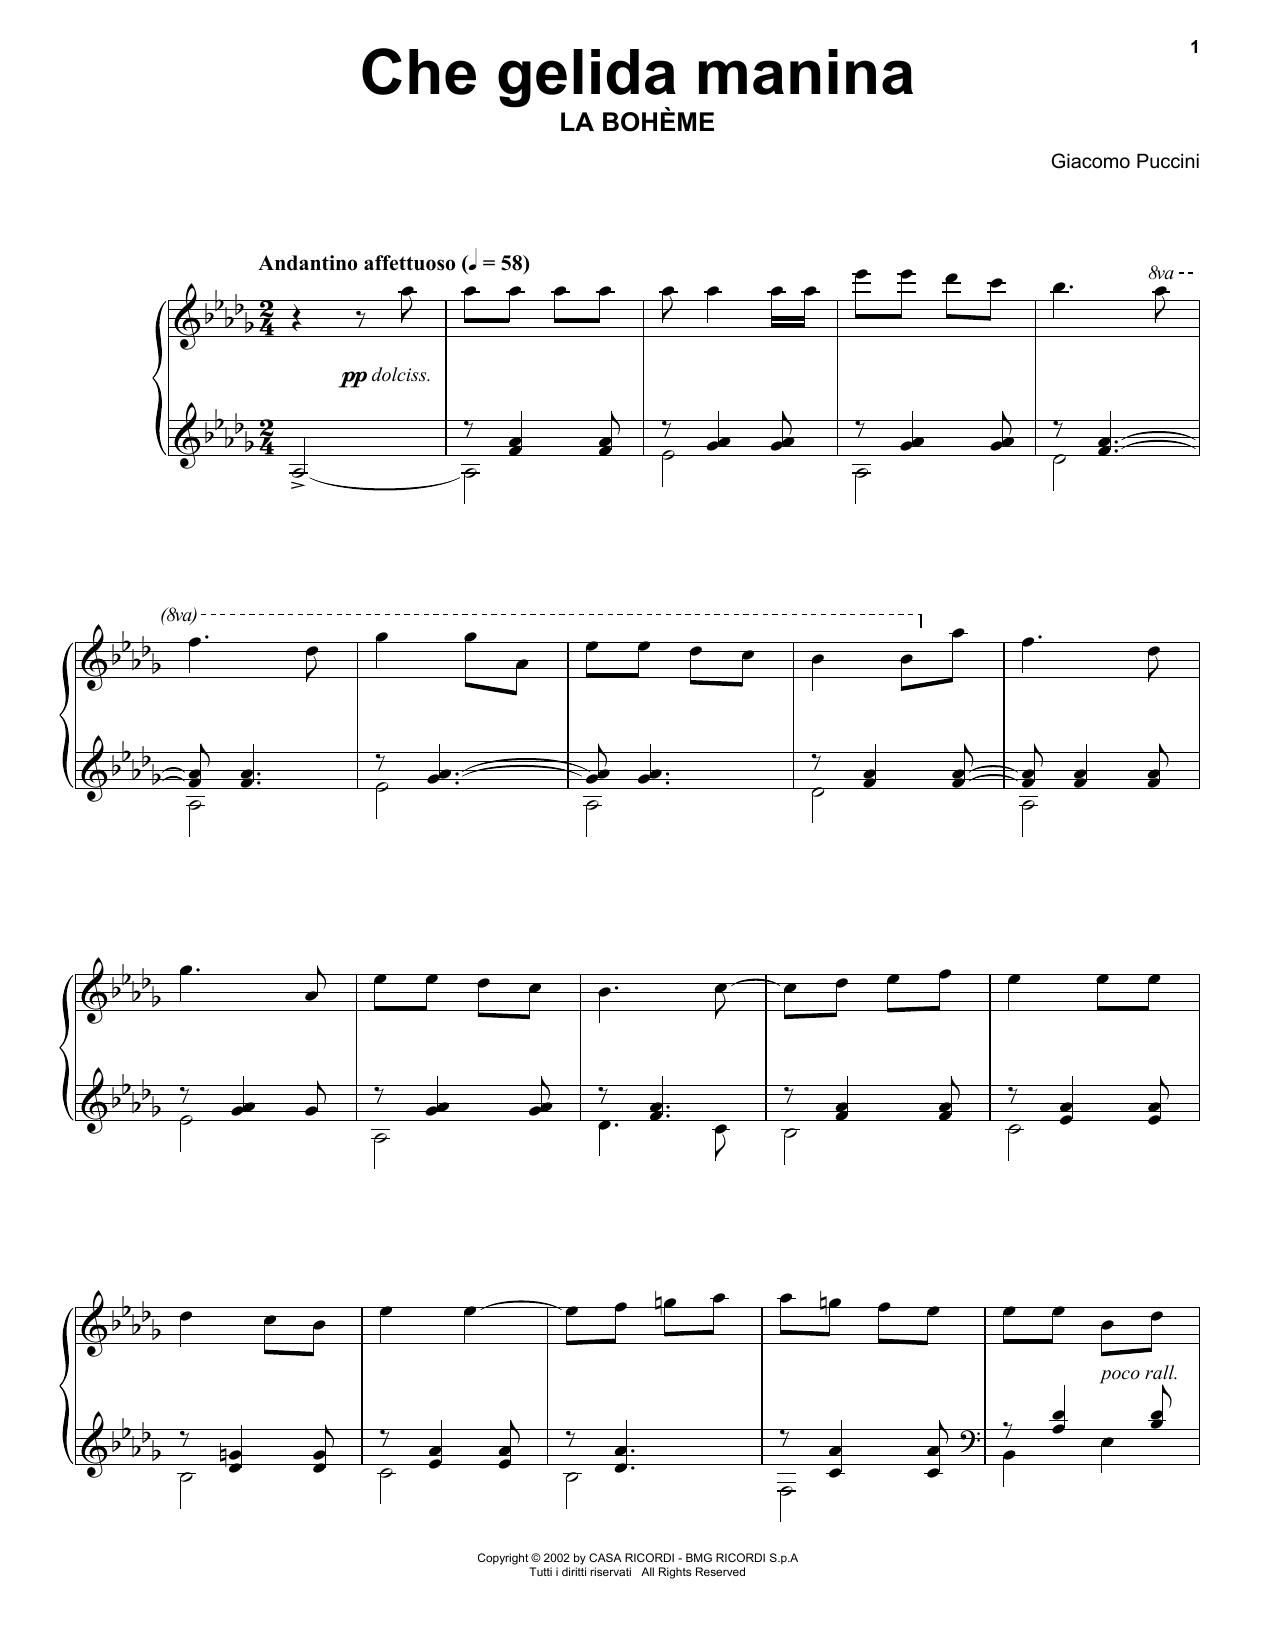 Giacomo Puccini Che gelida manina from La Bohème sheet music notes and chords. Download Printable PDF.